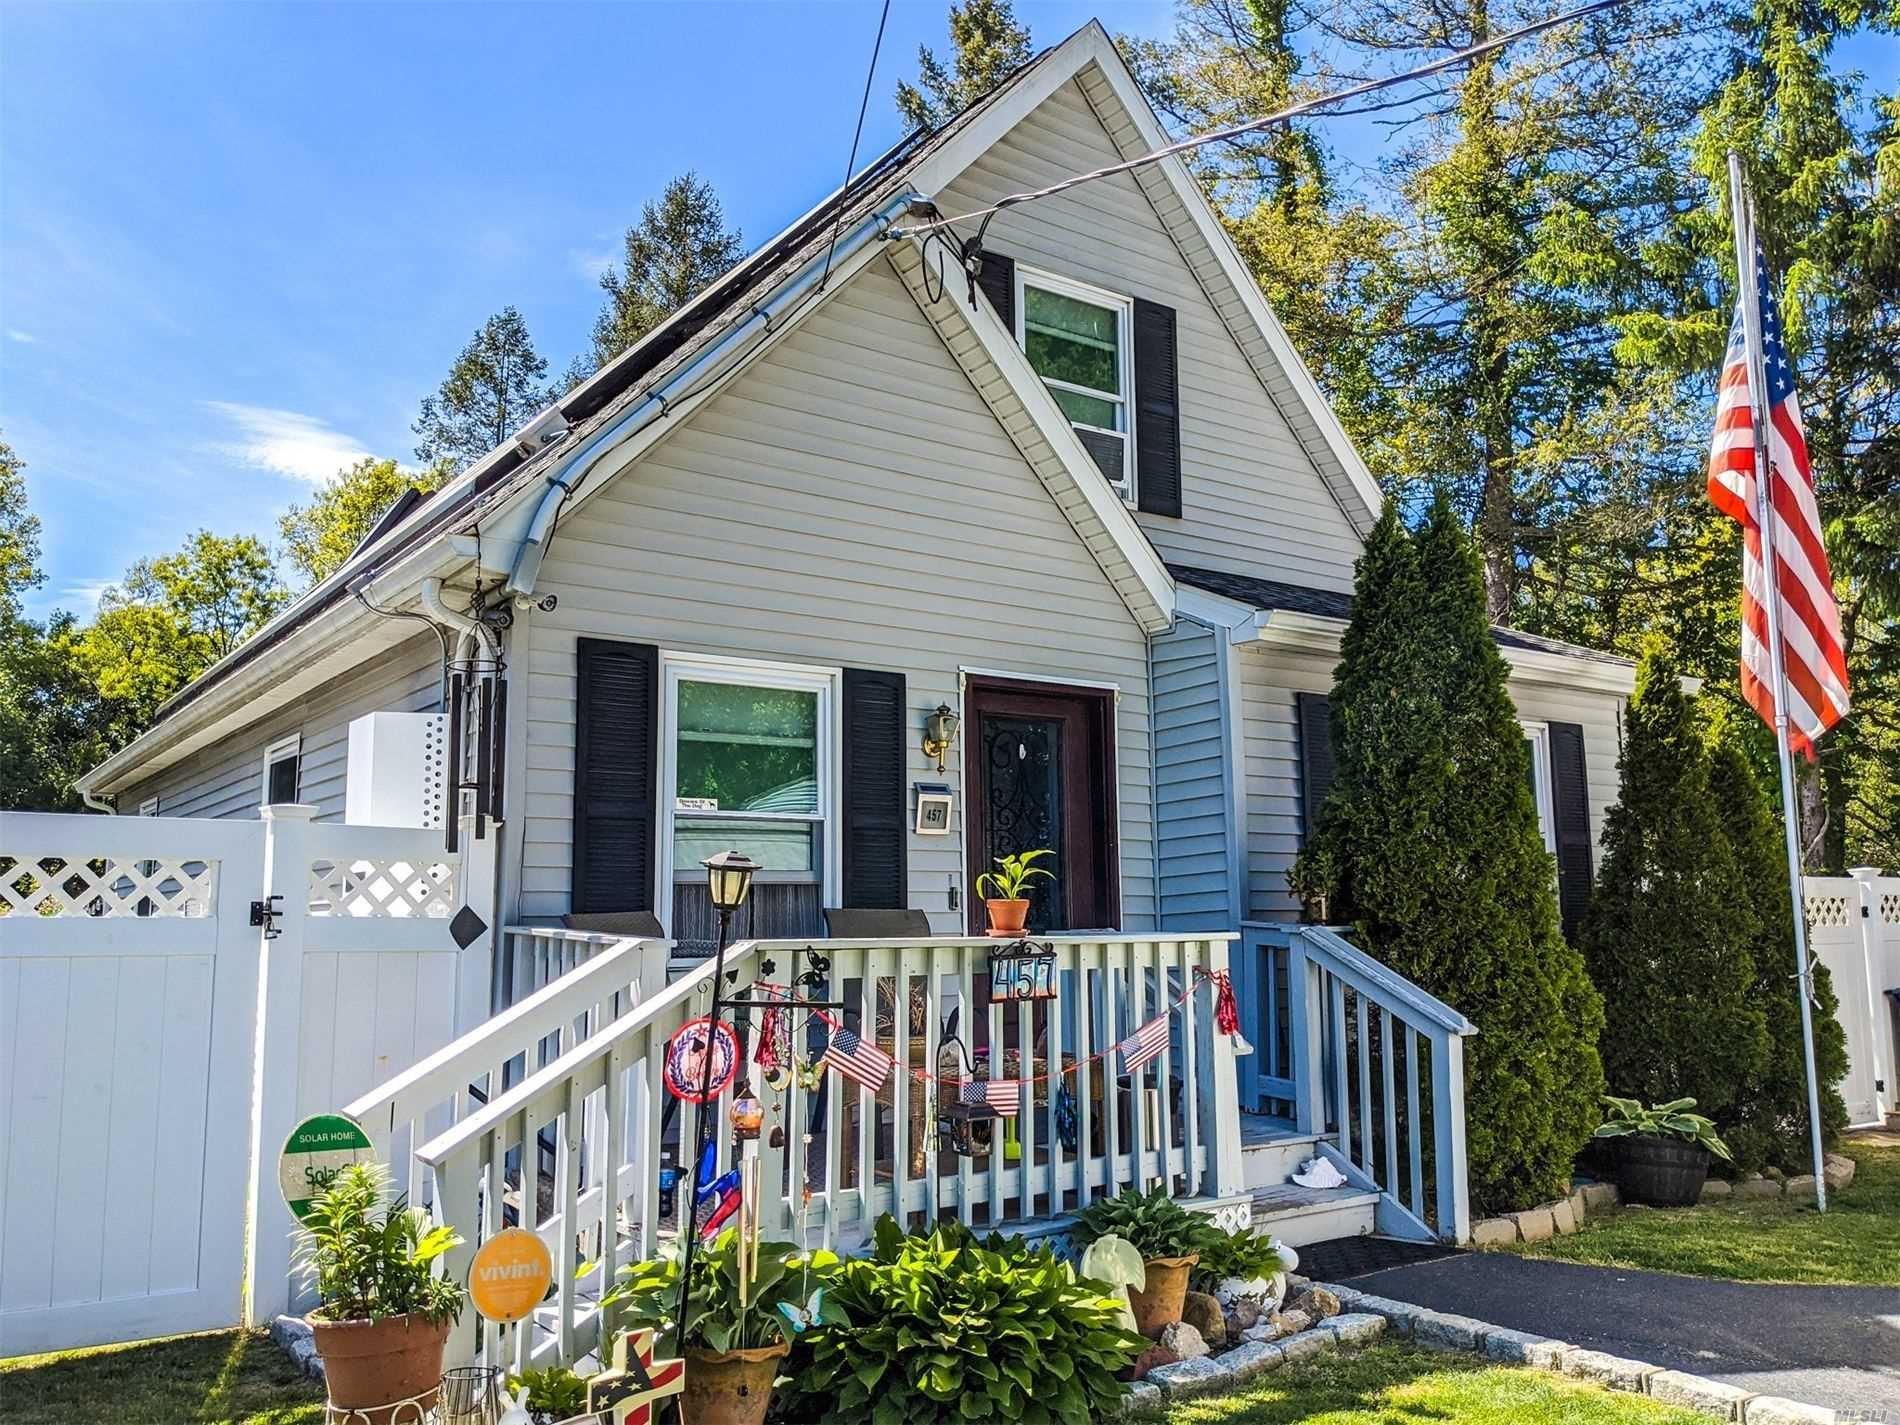 457 Birch Hollow Drive, Yaphank, NY 11980 - MLS#: 3216990